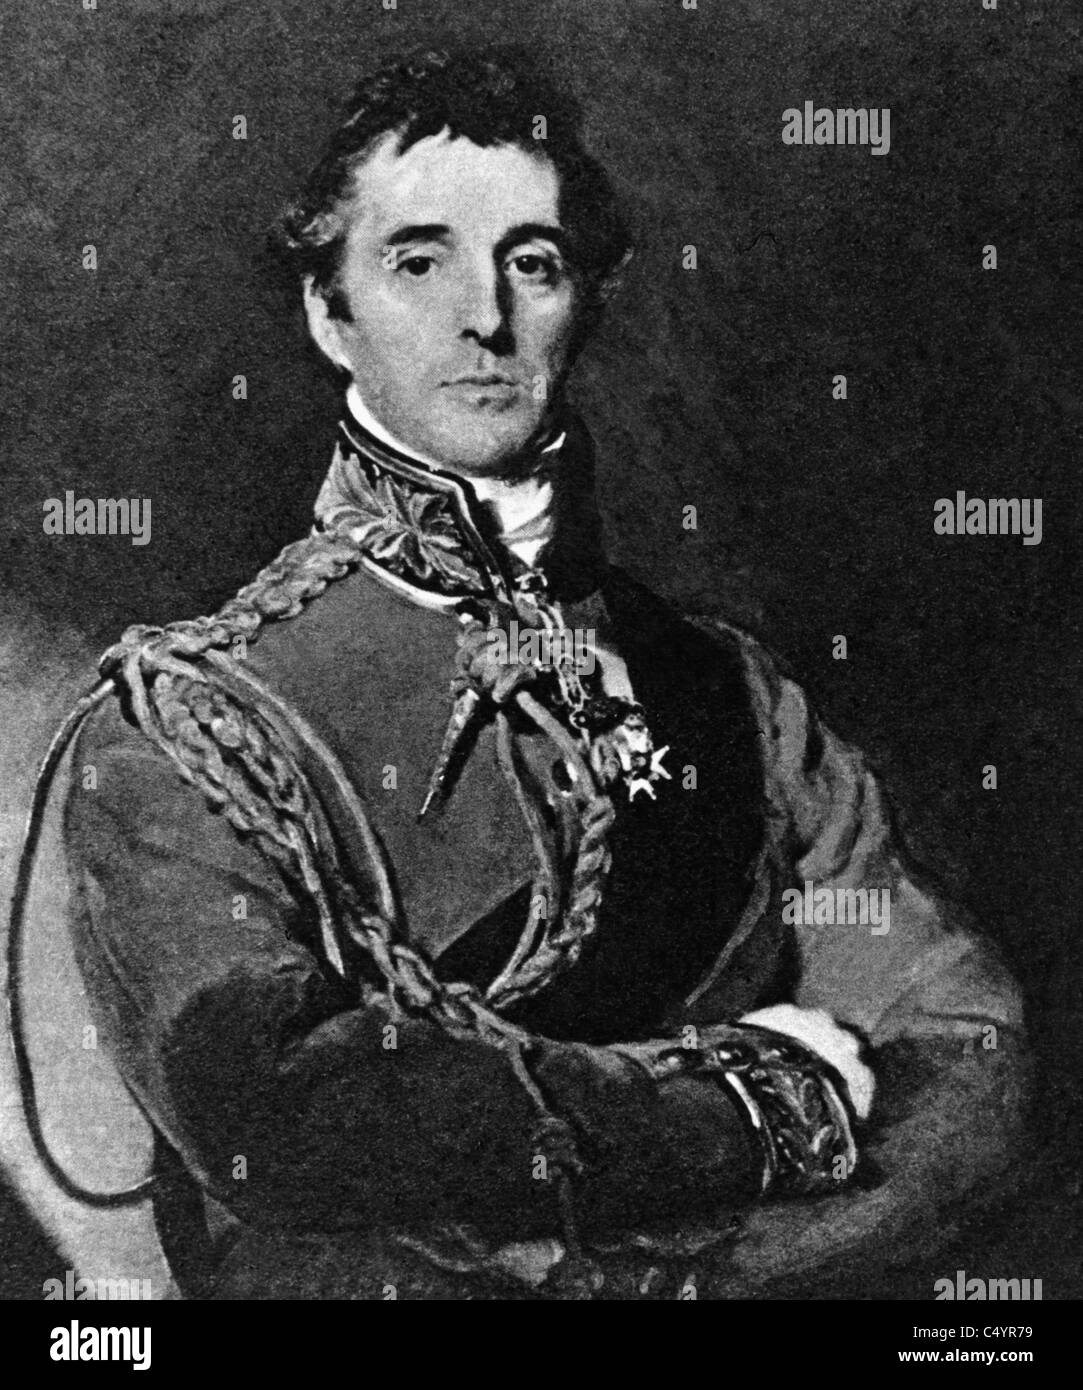 Arthur Wellesley, 1st Duke of Wellington - Stock Image